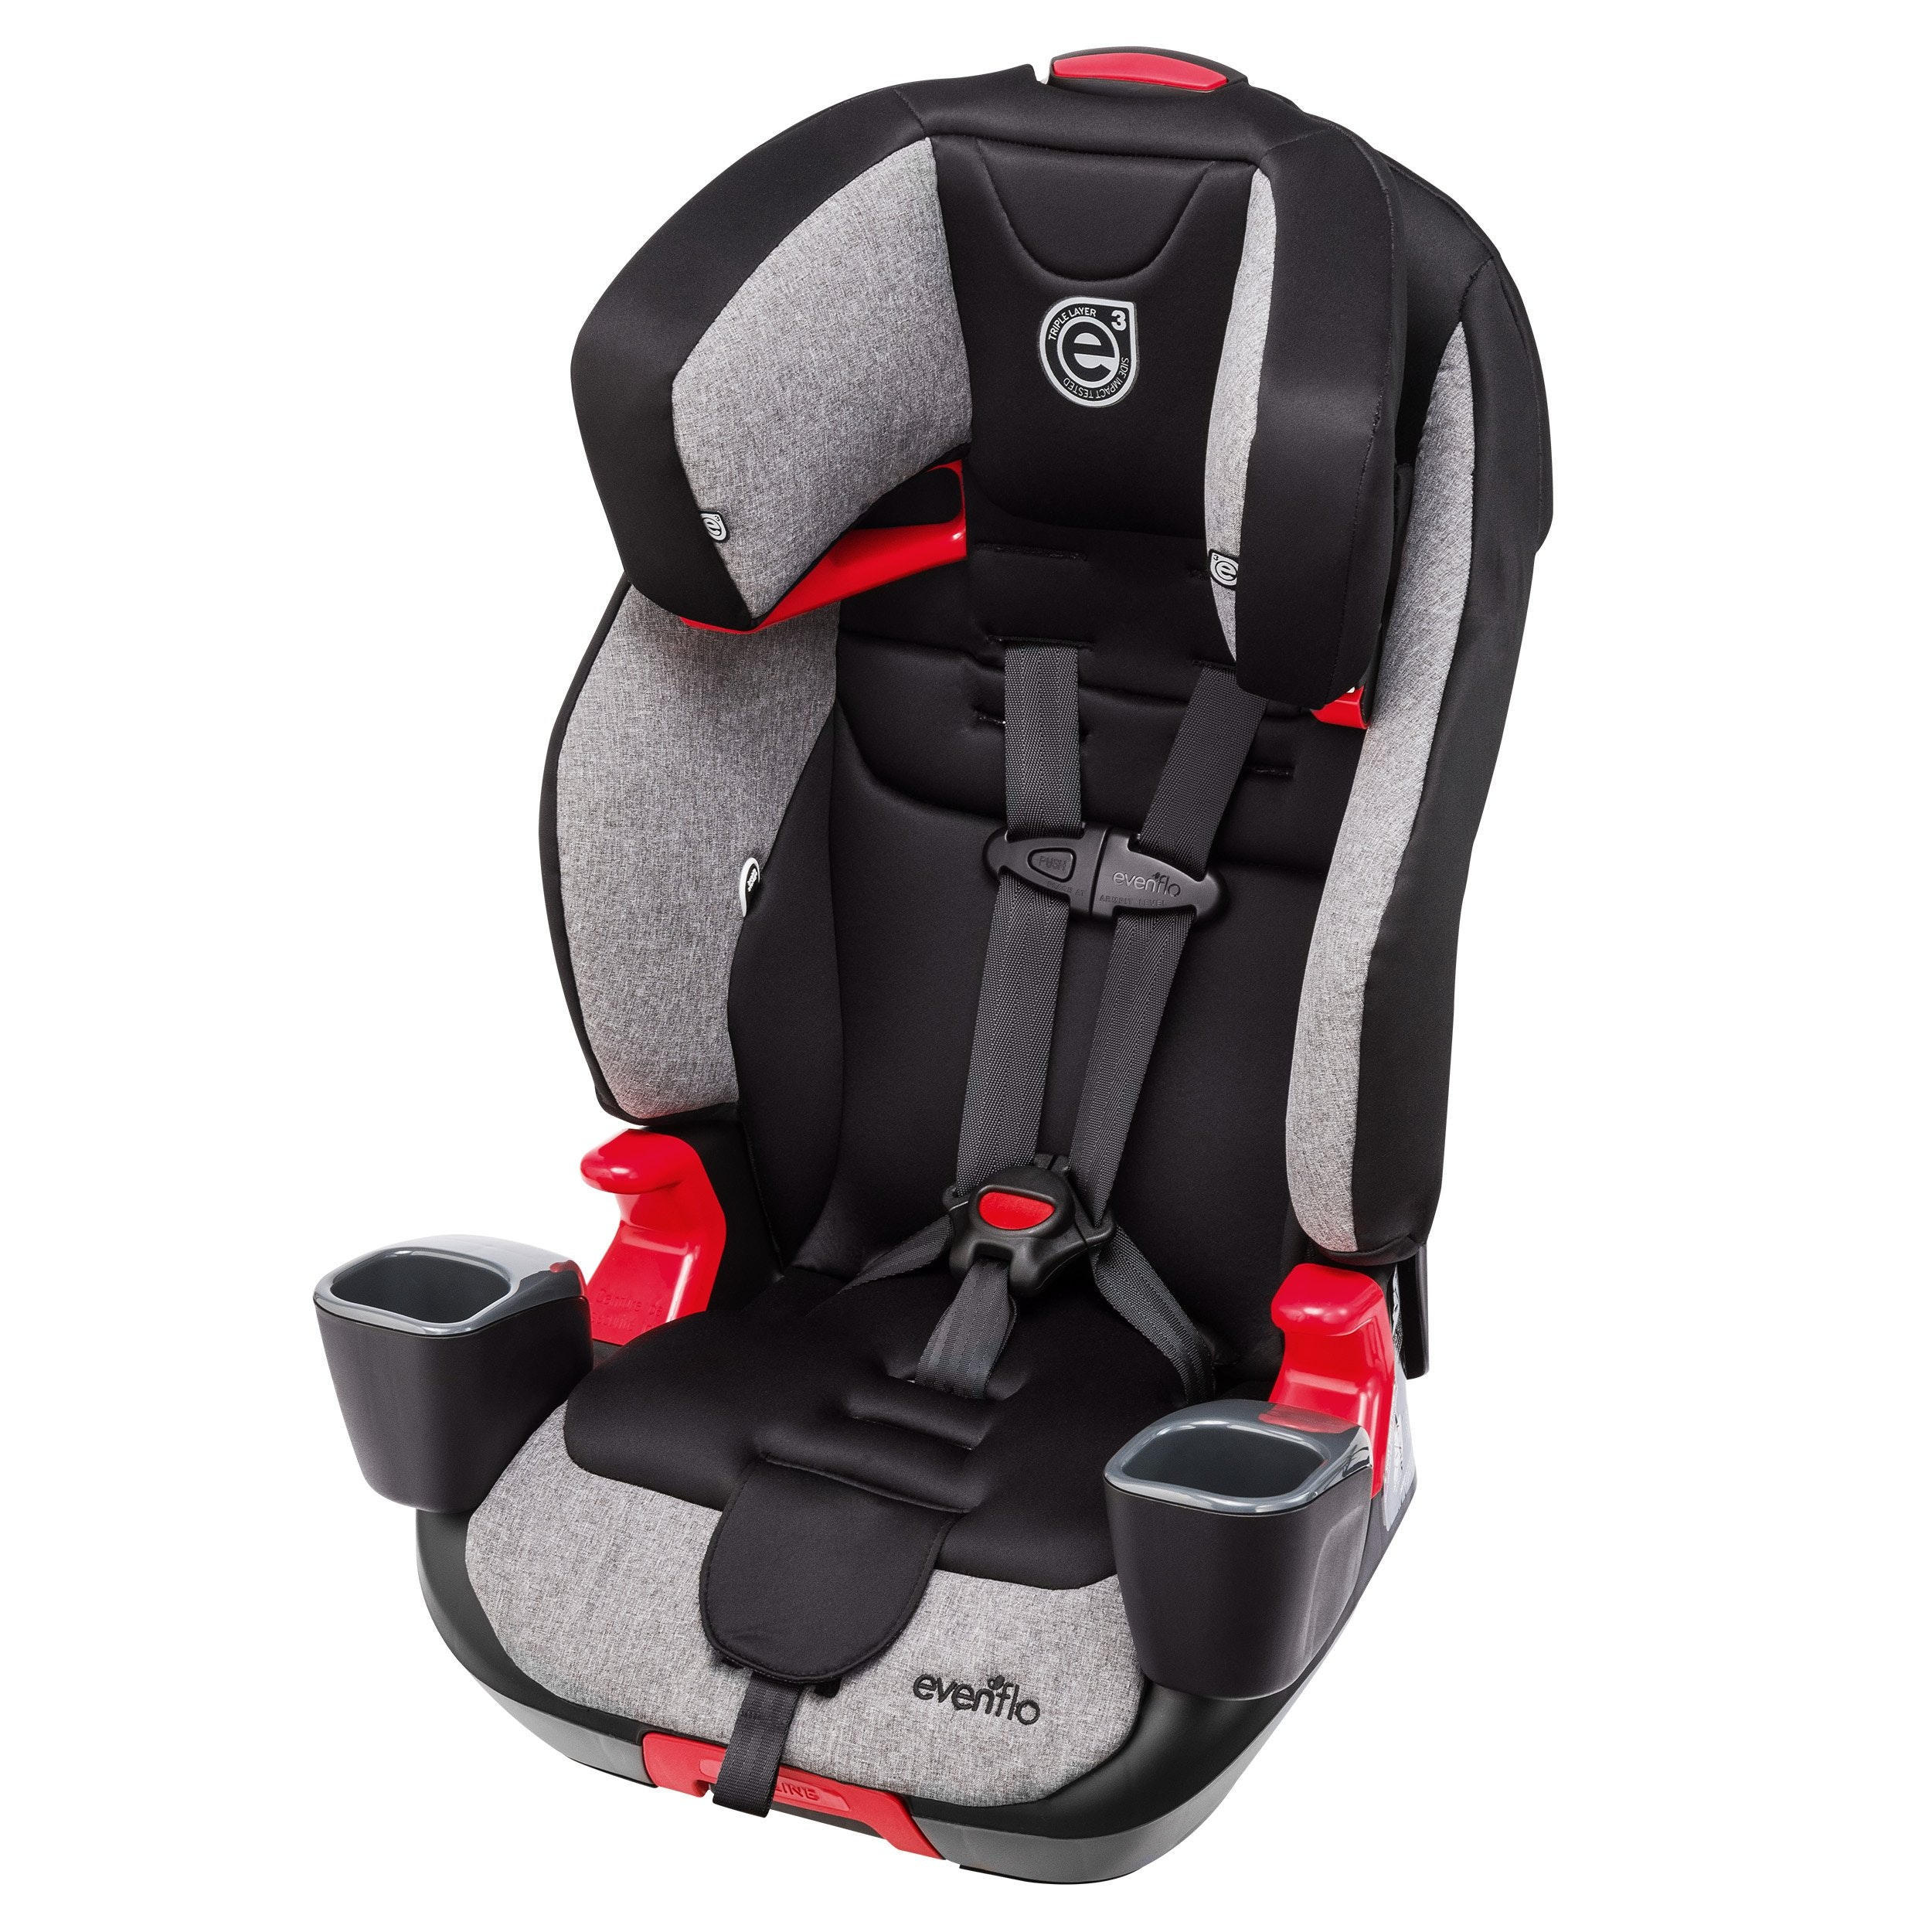 Evenflo Car Seat Guide | Instamotor